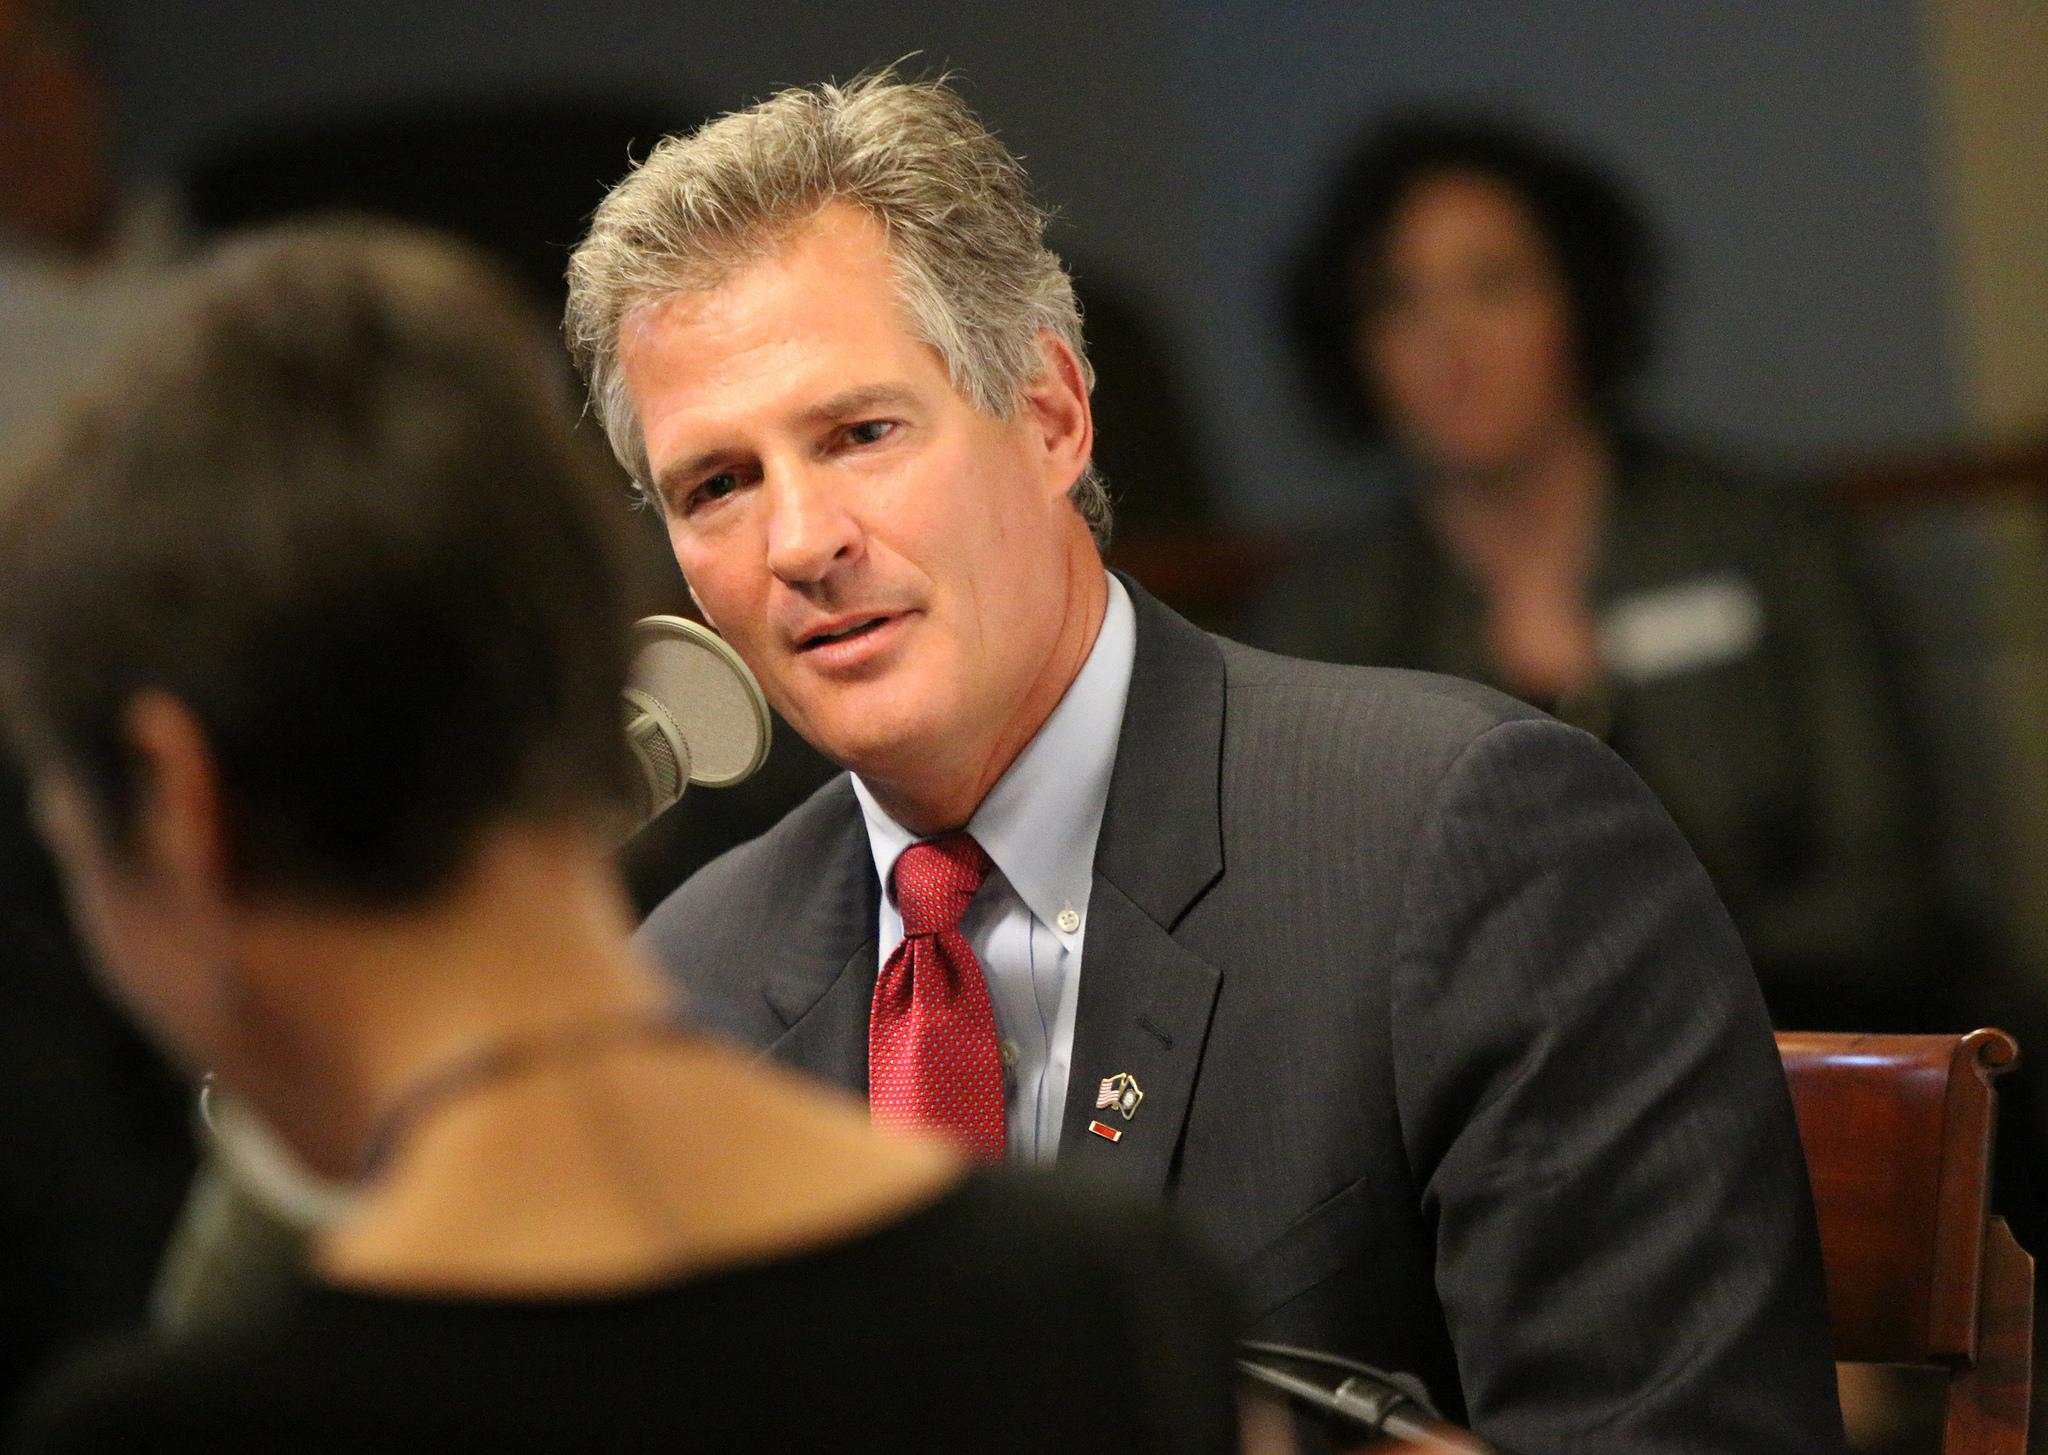 Laura Knoy interviews former MA Senator Scott Brown, 2014